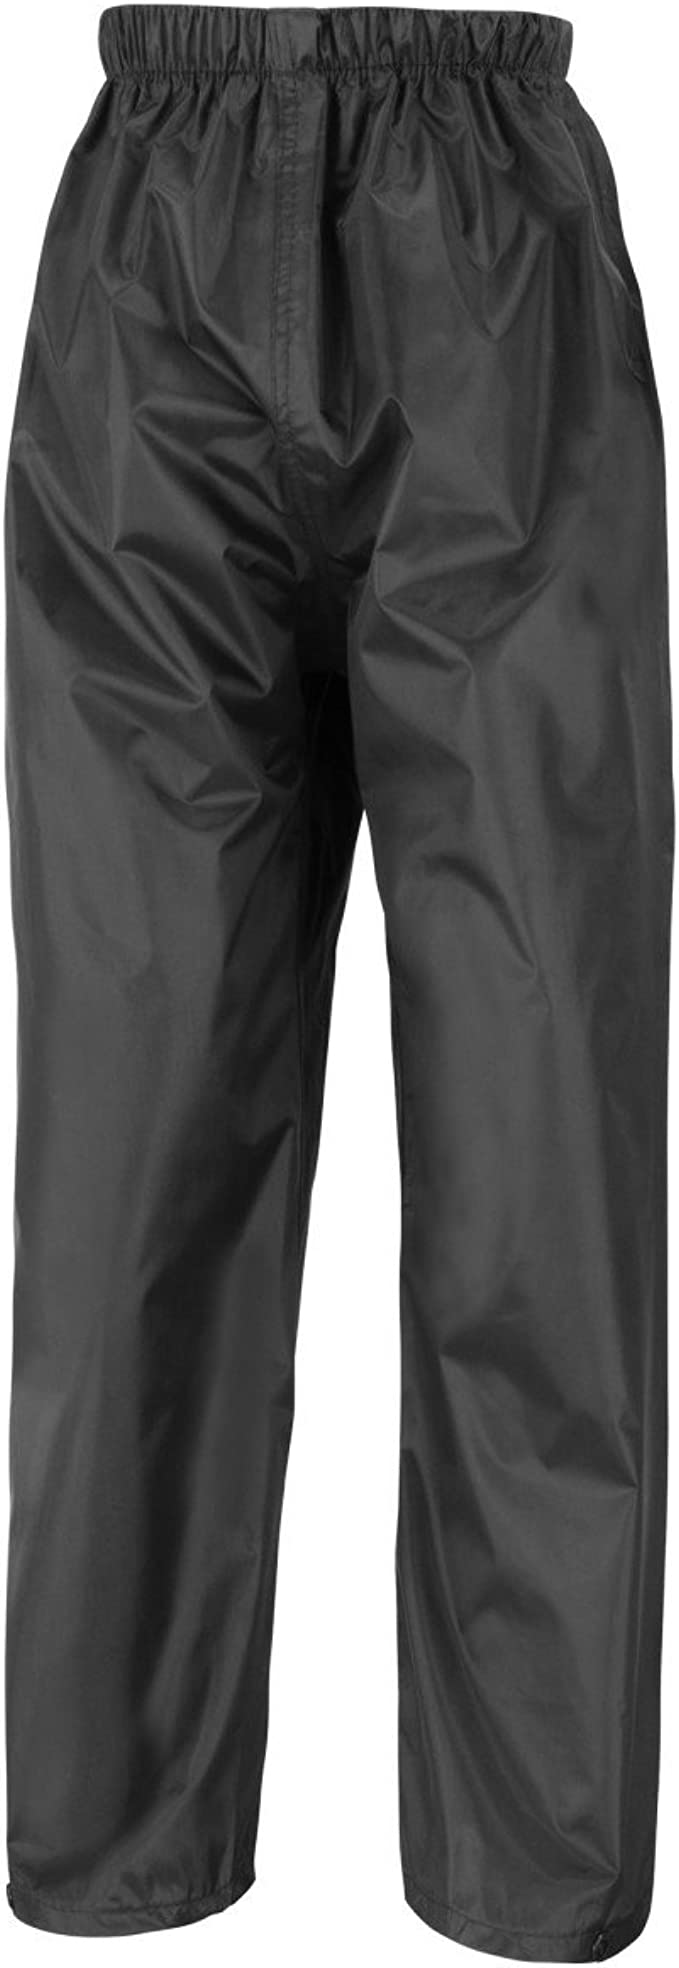 Pants Result Core Kids//Childrens Unisex Stormdri Rain Over Trouser